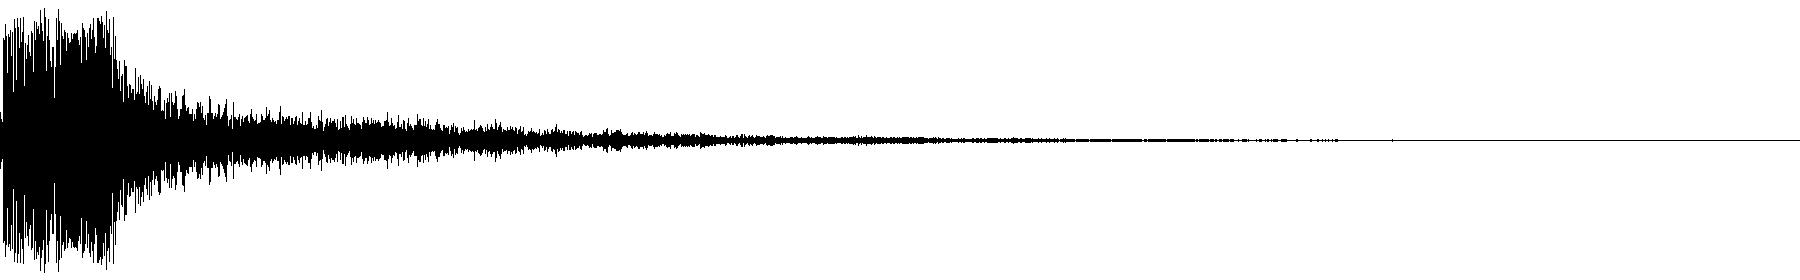 shg percussion 10